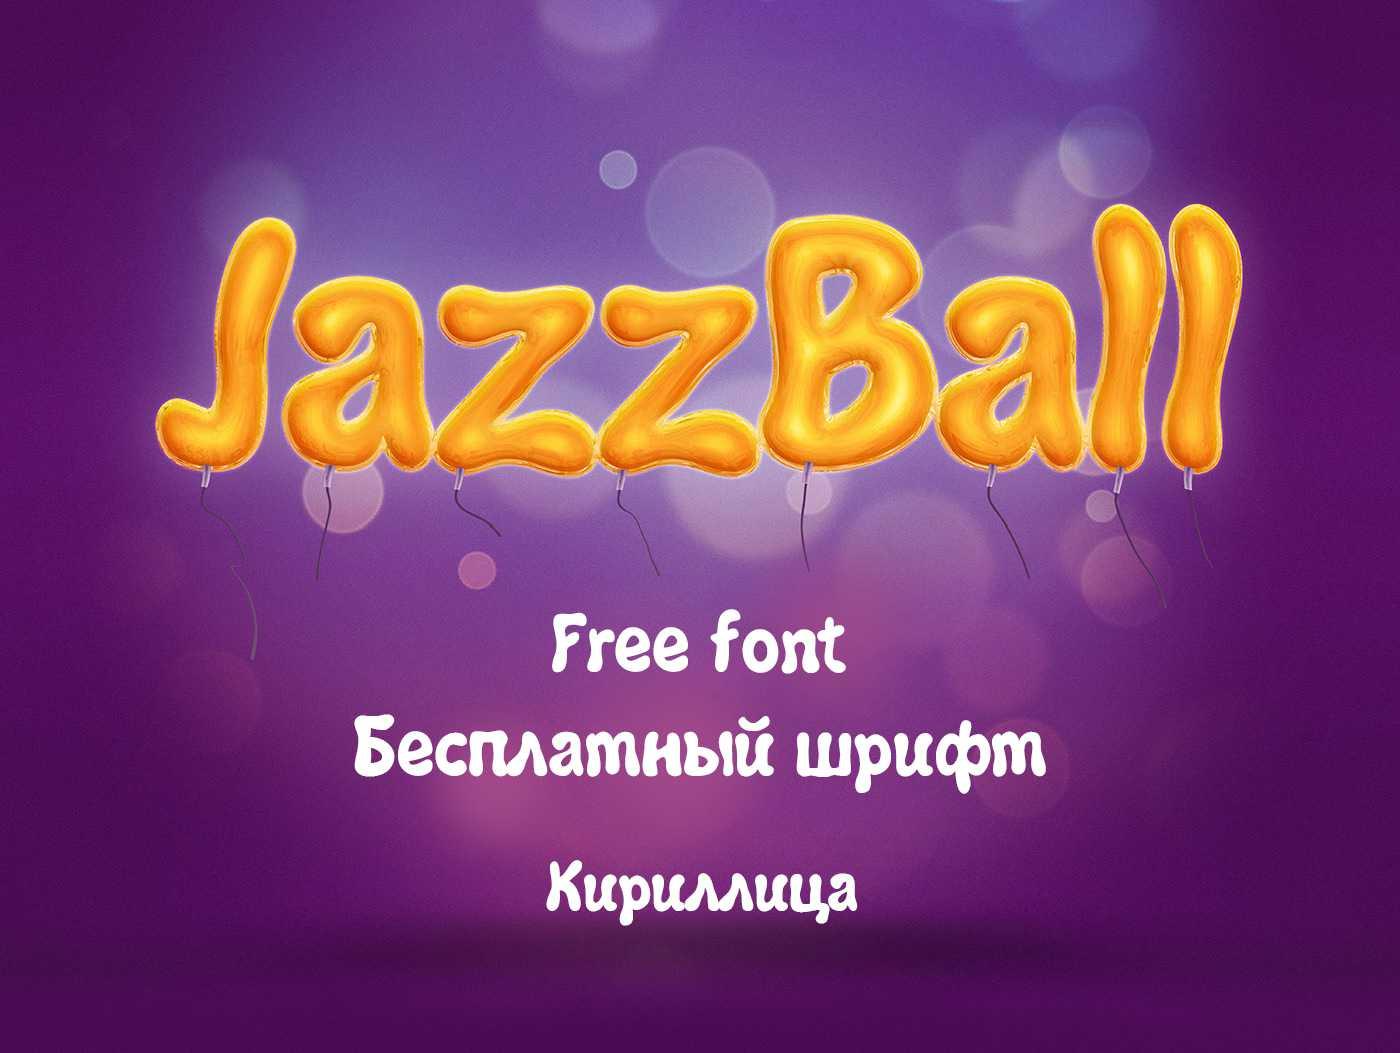 Шрифт Jazz Ball кириллица скачать